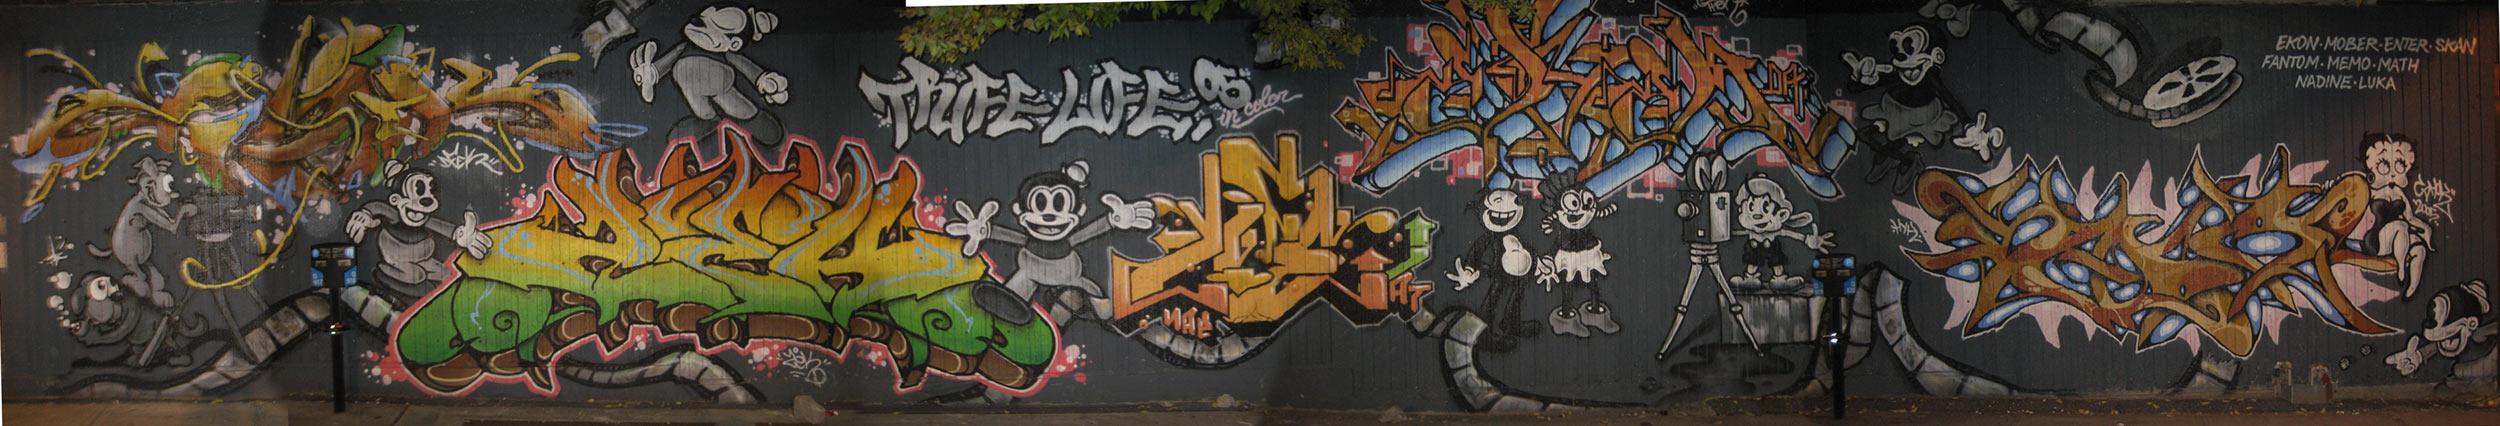 montrealgraffiti_b